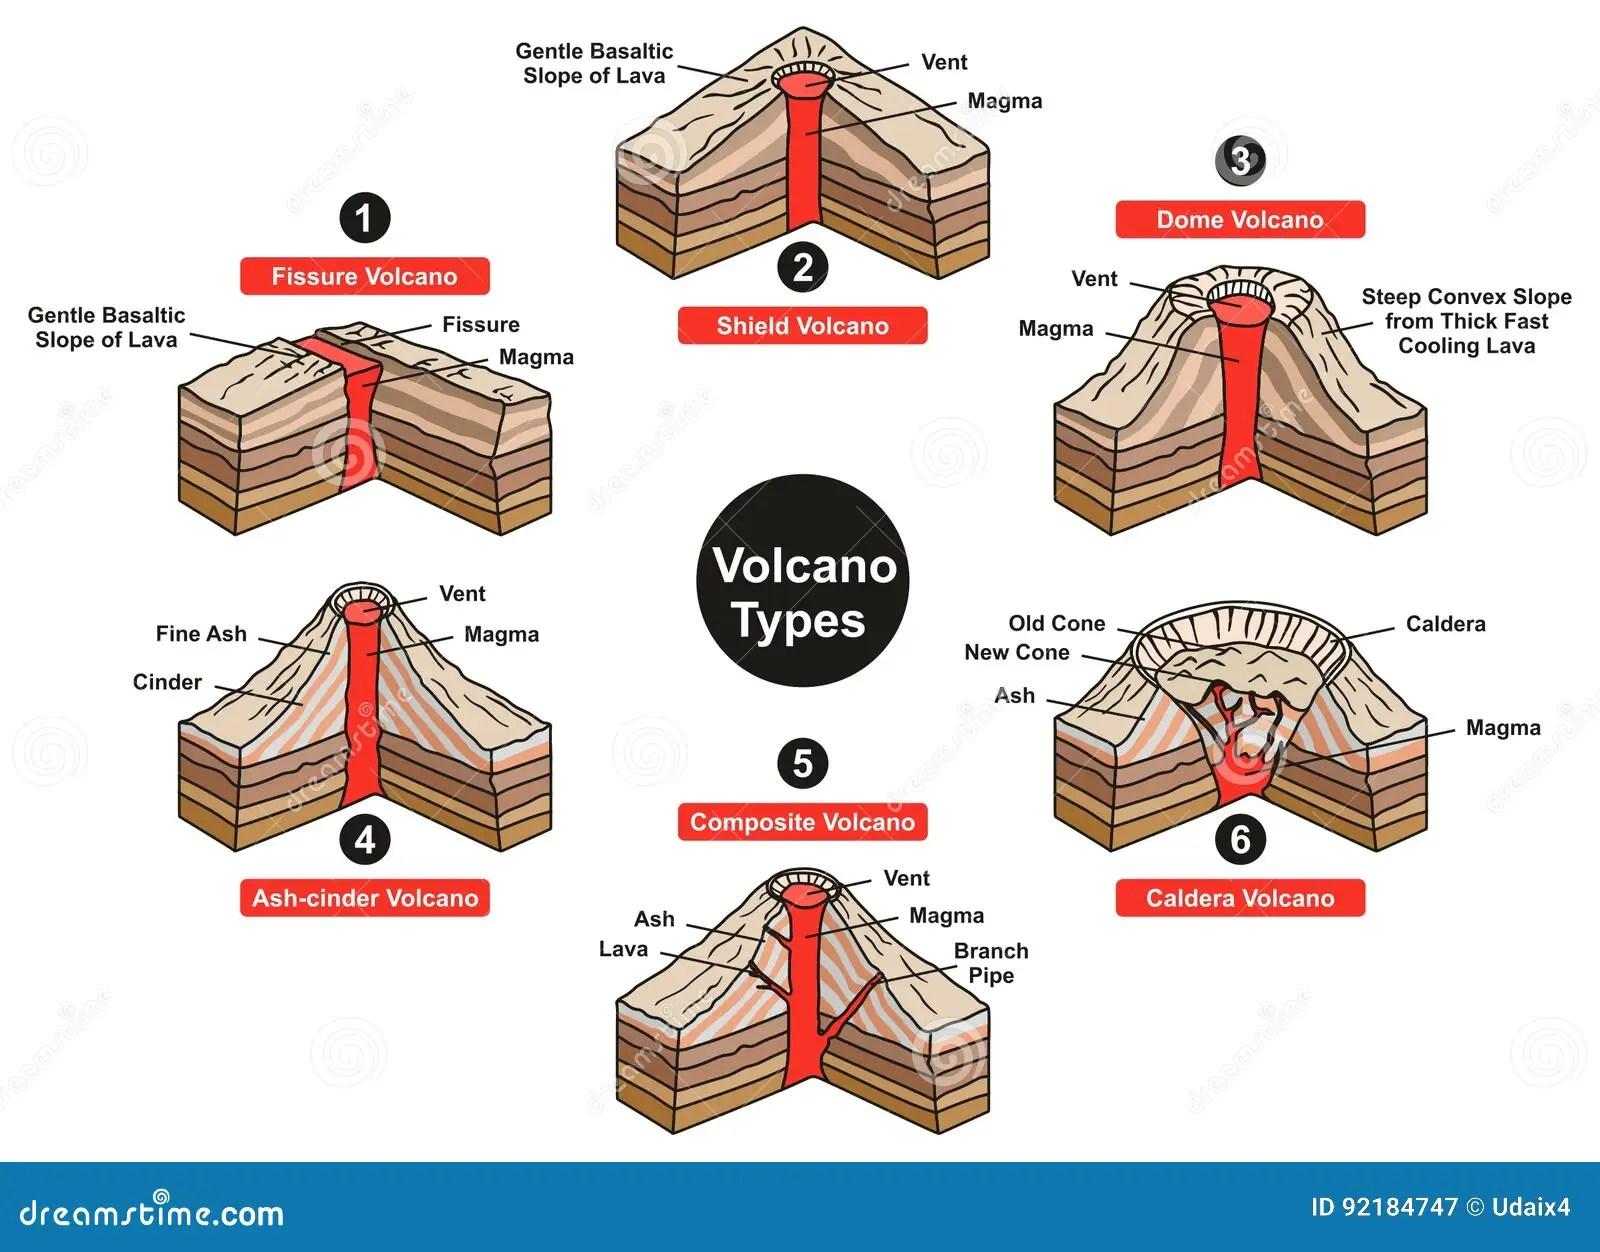 Volcano Types Infographic Diagram Stock Vector